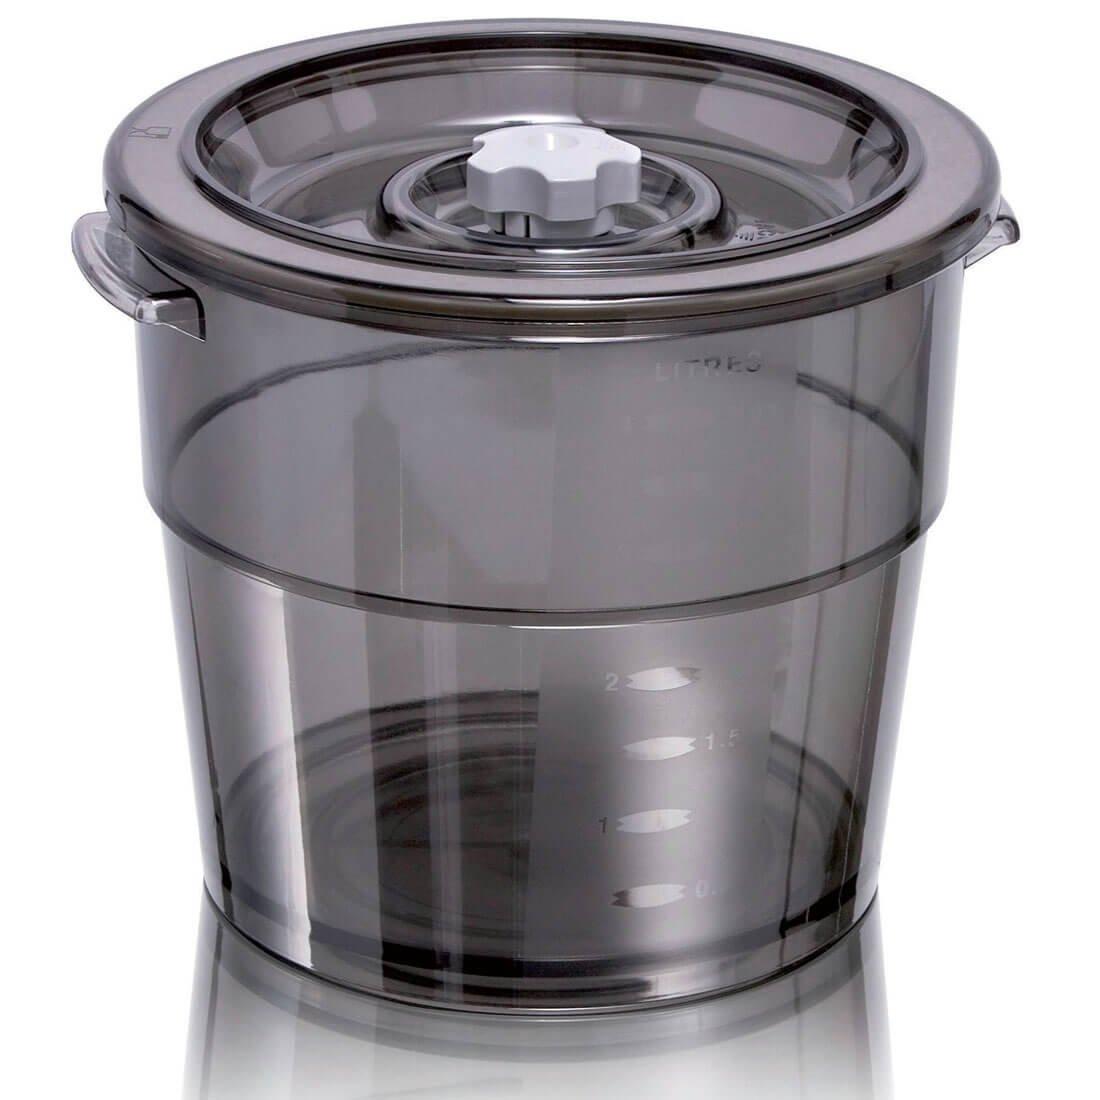 Magic vac aco1004Round Pan 1.5L Grey, transparent 1pc (S) Food Storage Container–Food Storage, (103mm, 1PC (S)) (103mm 1PC (S)) RI8956/70